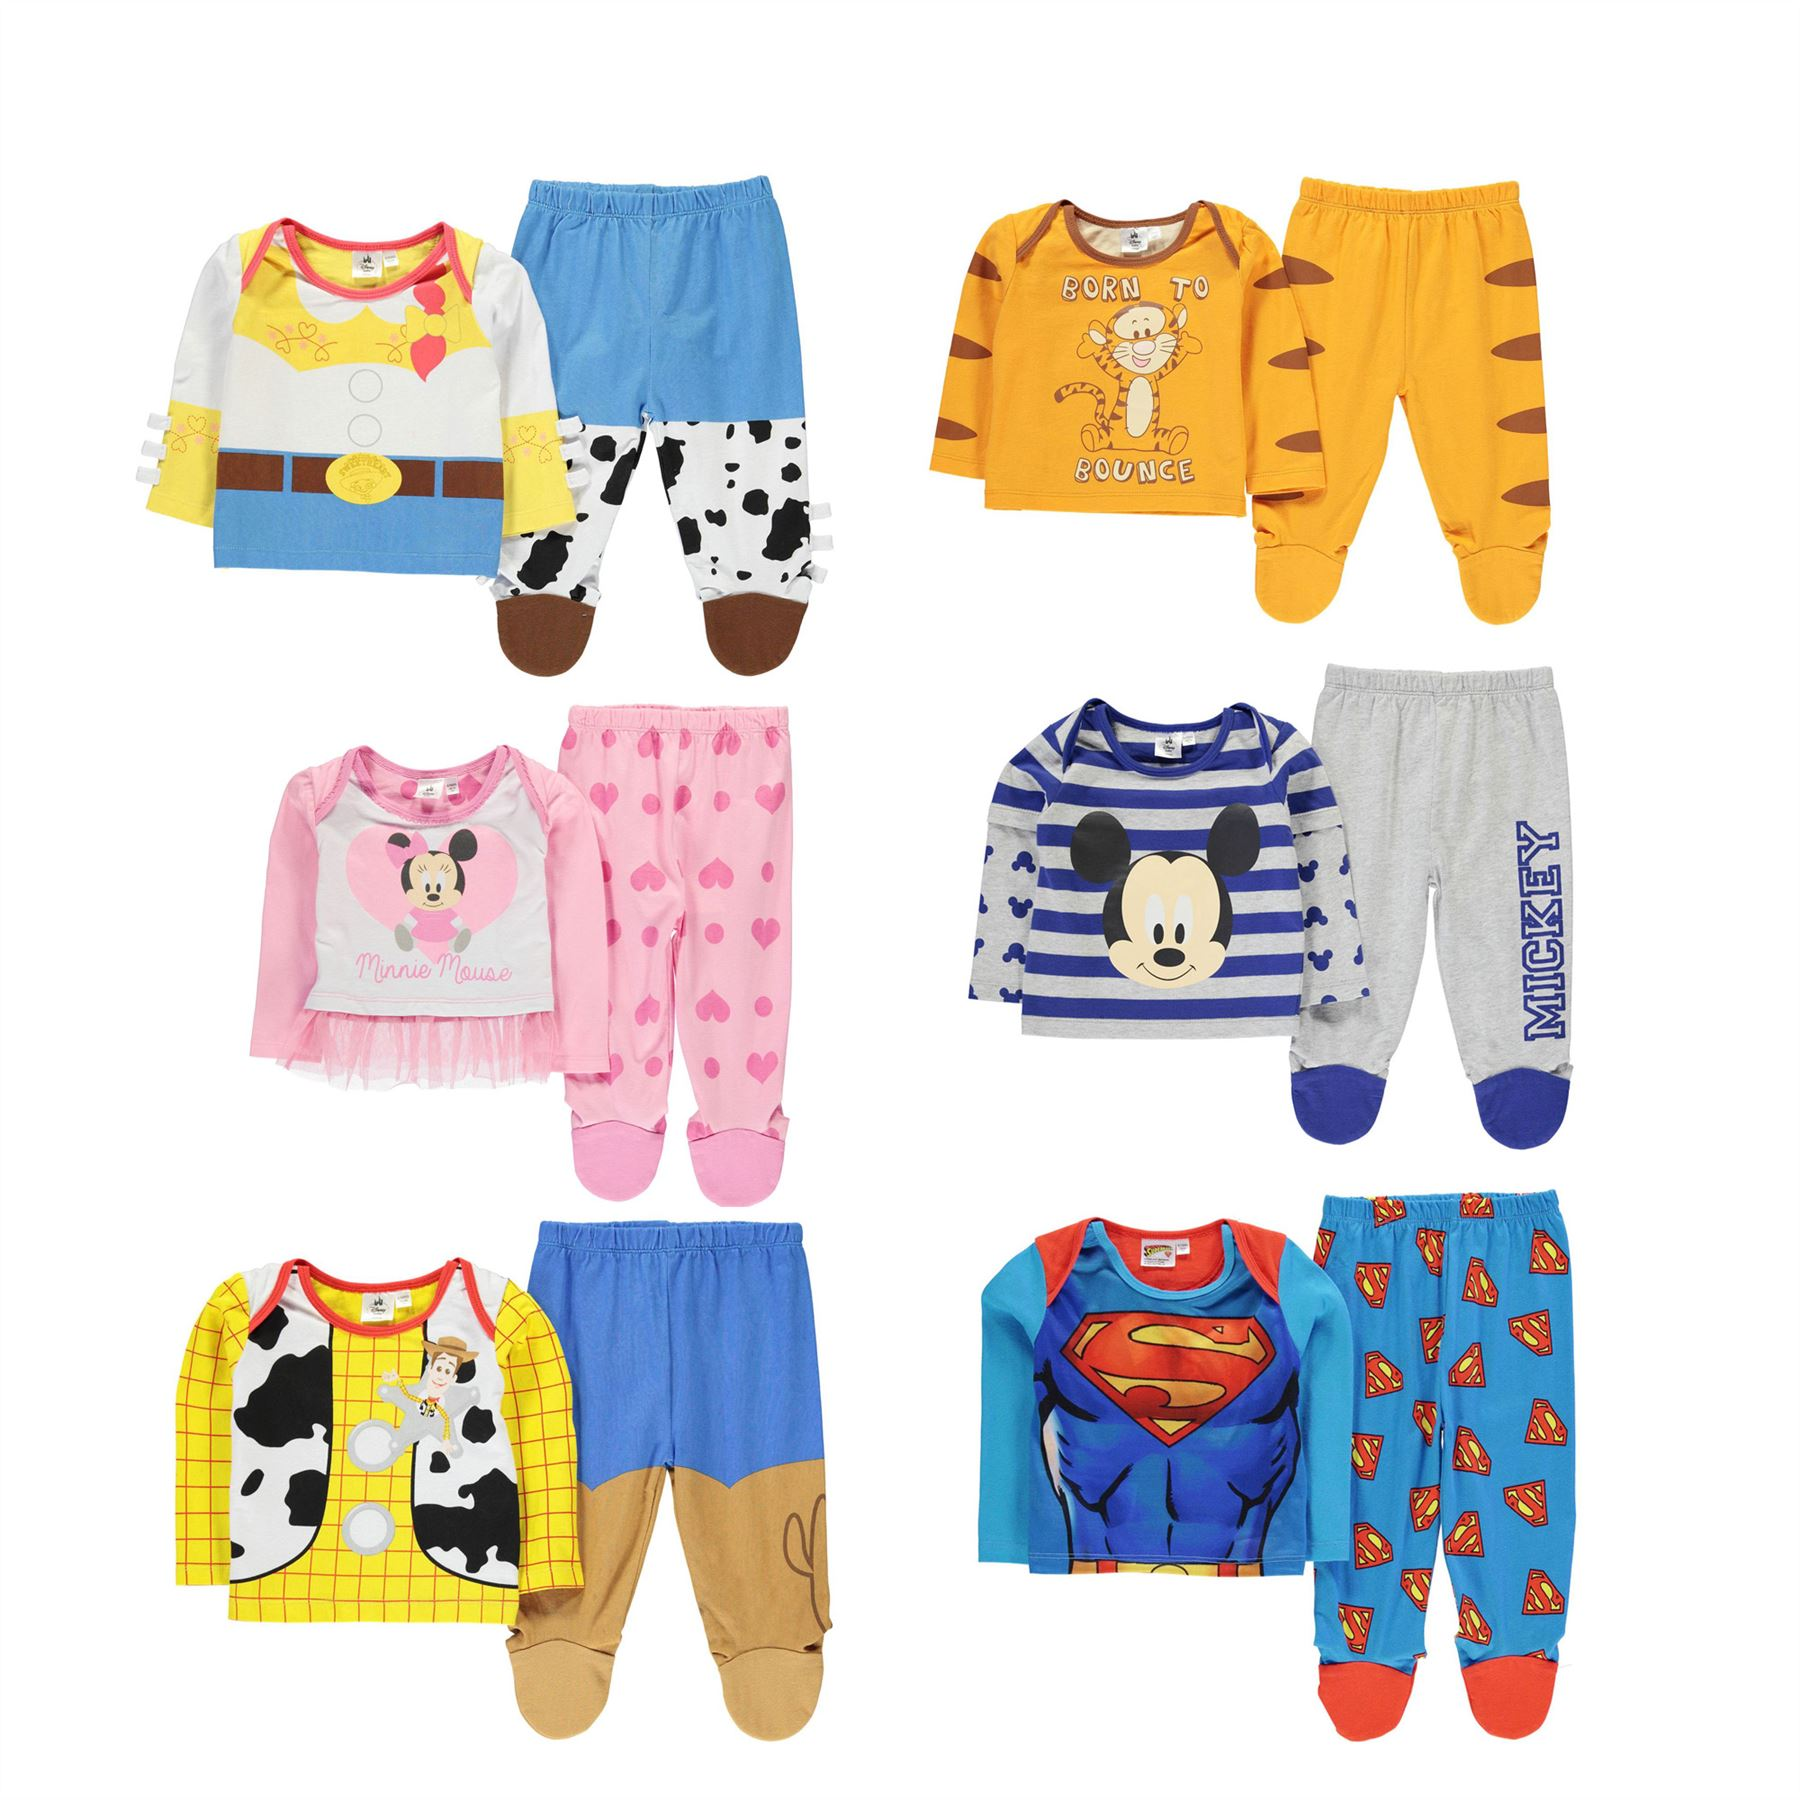 PJ Masks catboy owlette Gekko Officiel Cadeau pour Bébé Garçons Court Pyjamas